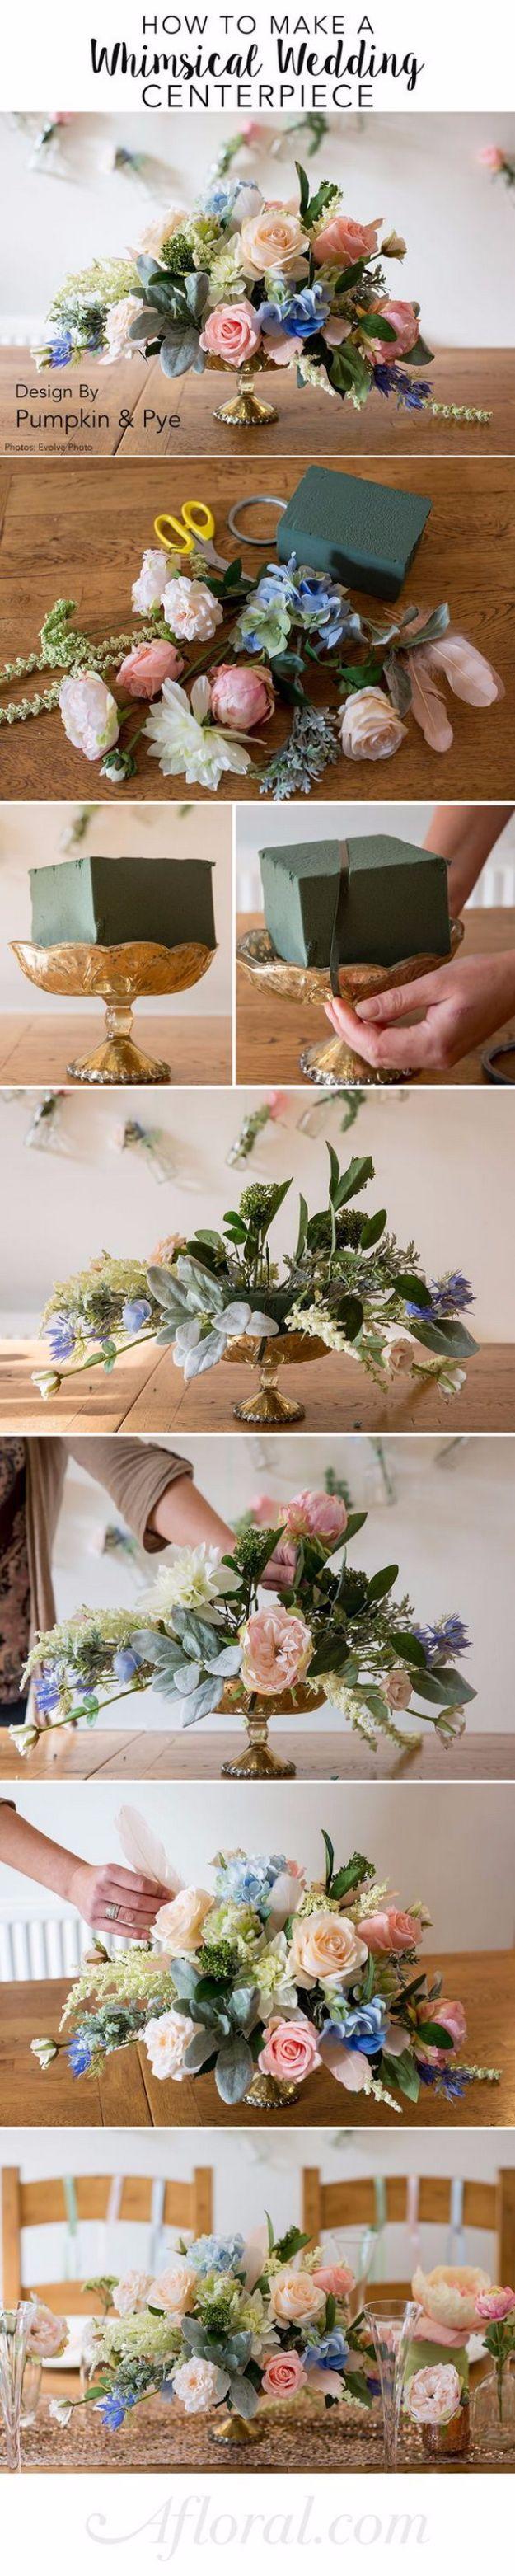 DIY Wedding Centerpieces - DIY Whimsical Wedding Centerpiece - Cheap Wedding Centerpieces to Make at Home - DIY floral ideas for Weddings